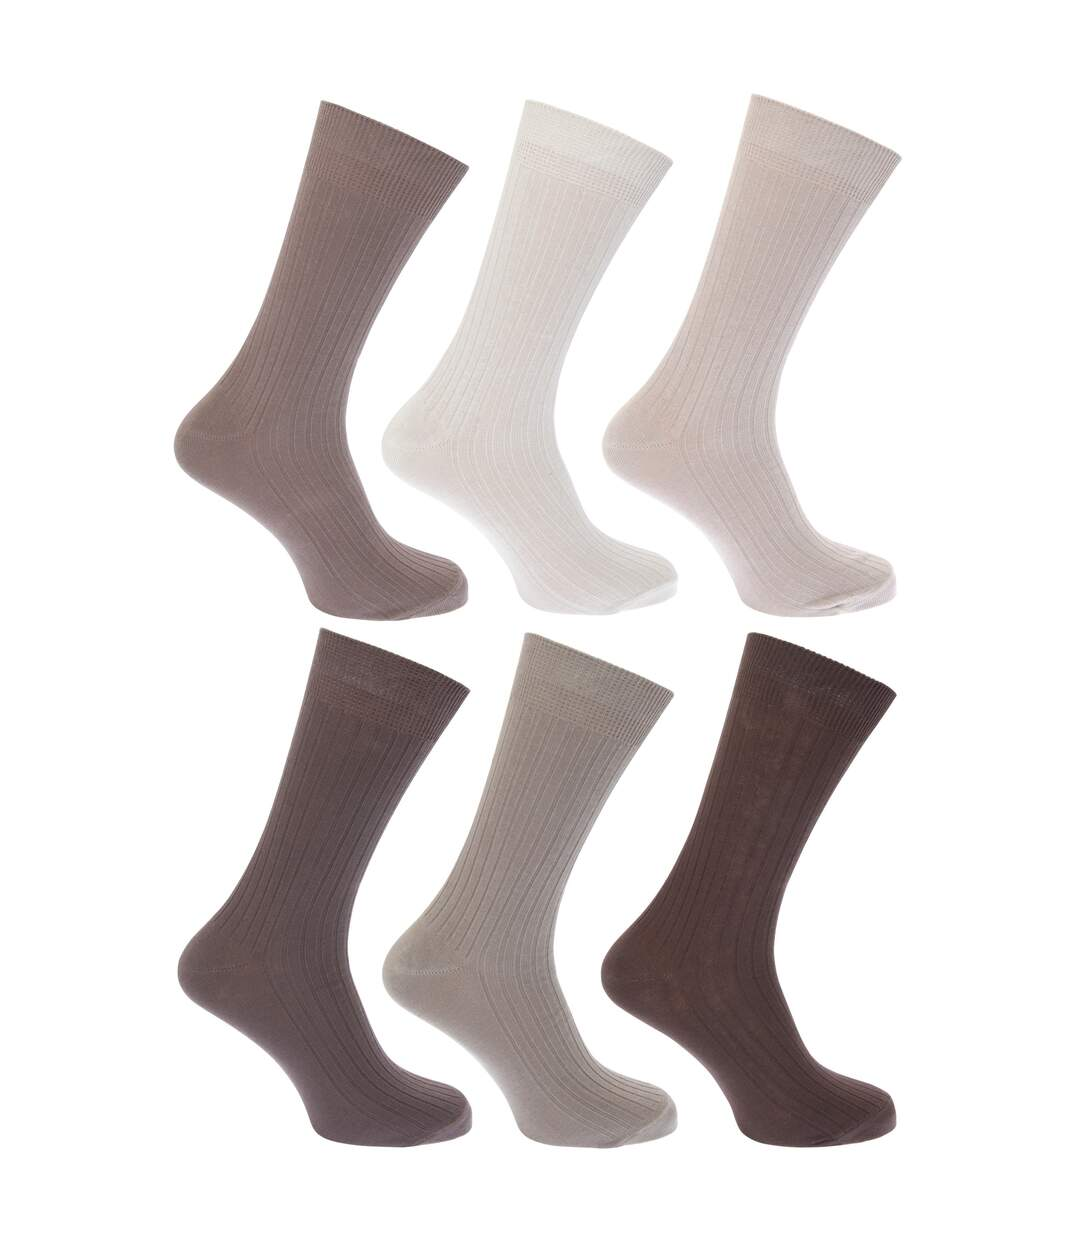 FLOSO Mens Ribbed 100% Cotton Socks (Pack Of 6) (Shades of Brown) - UTMB185